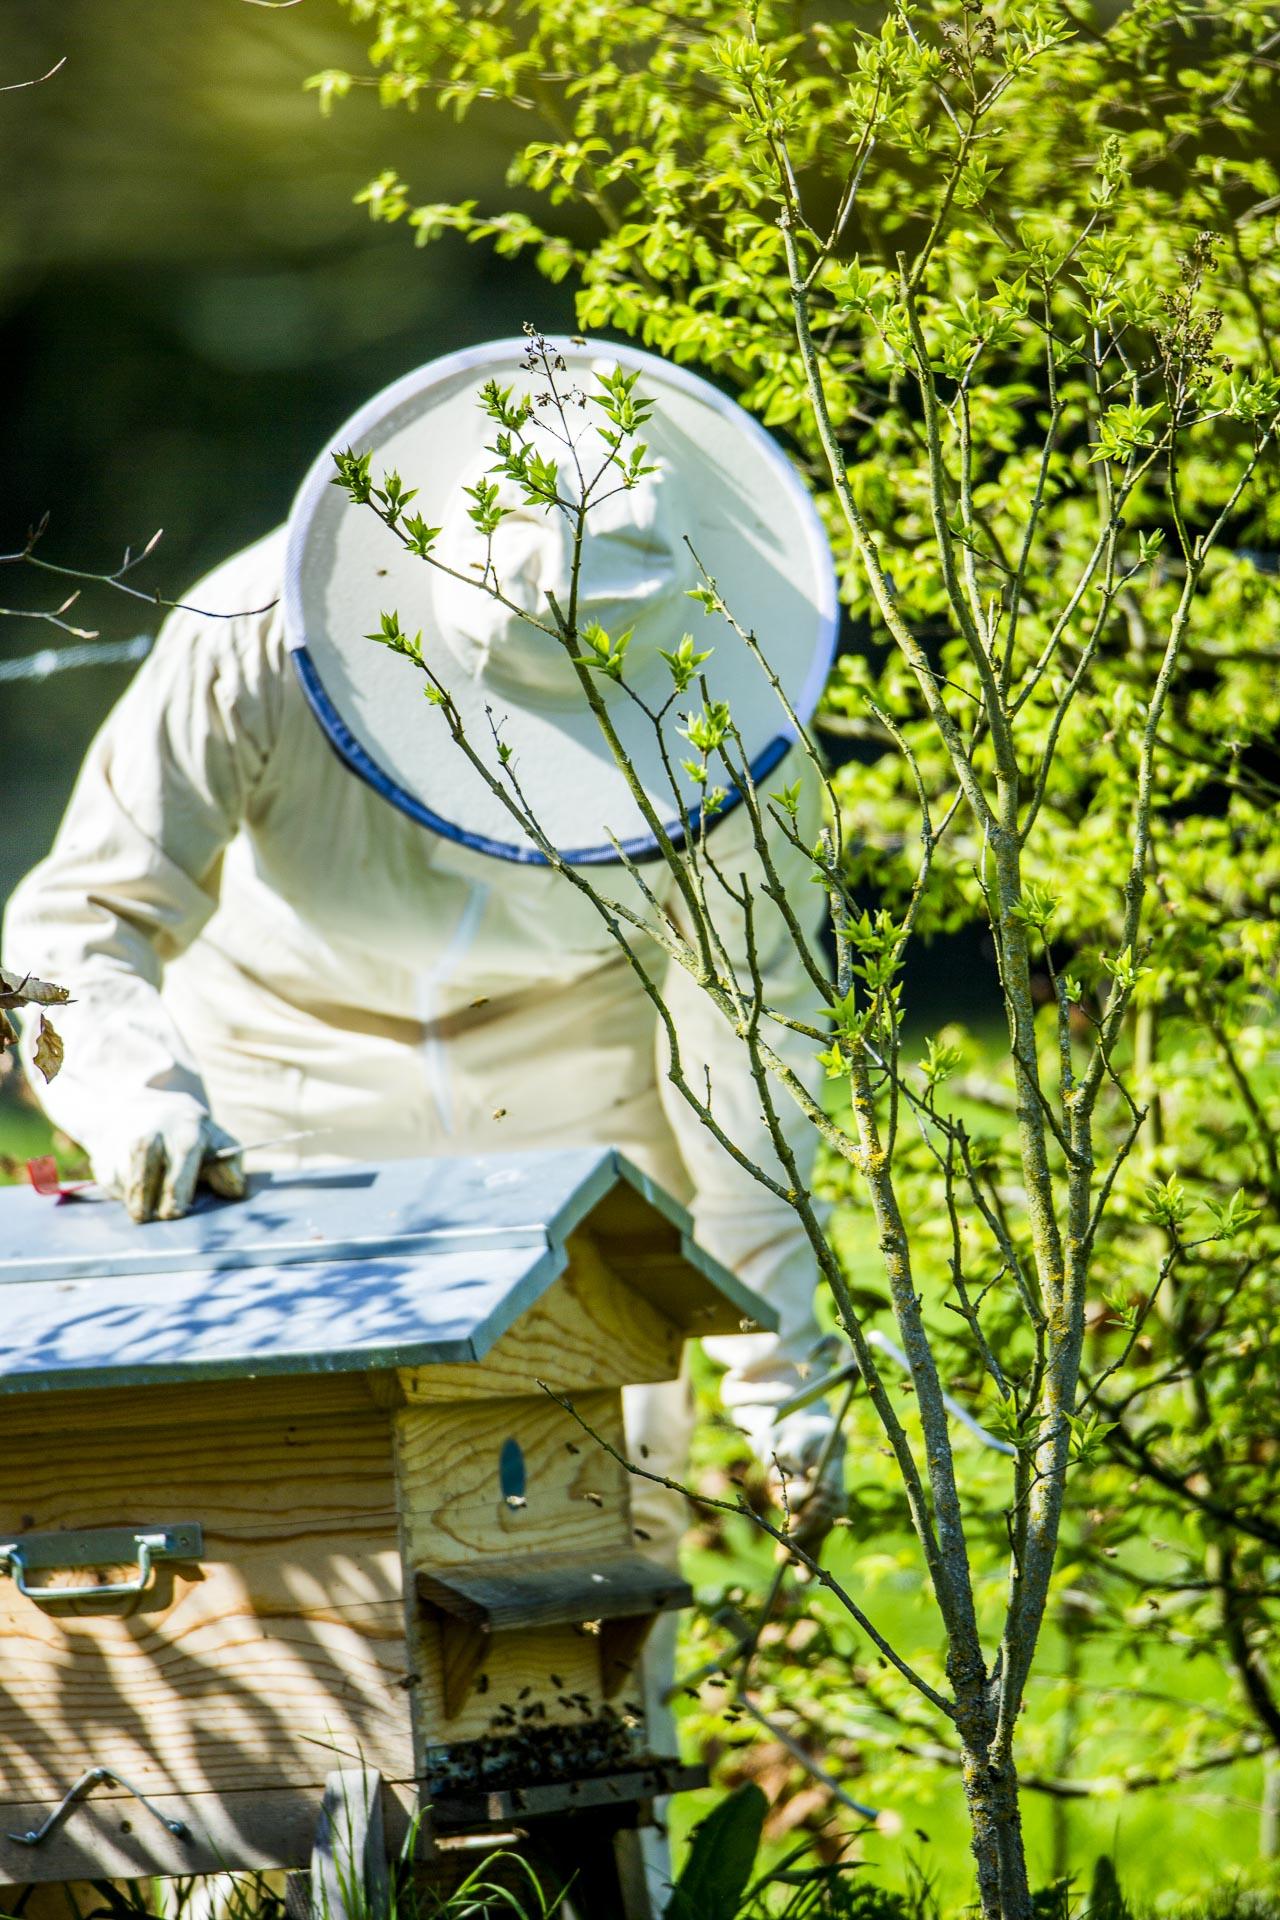 domaine_dablon_activites_ruches_abeilles©stephaneleroy-3158.jpg